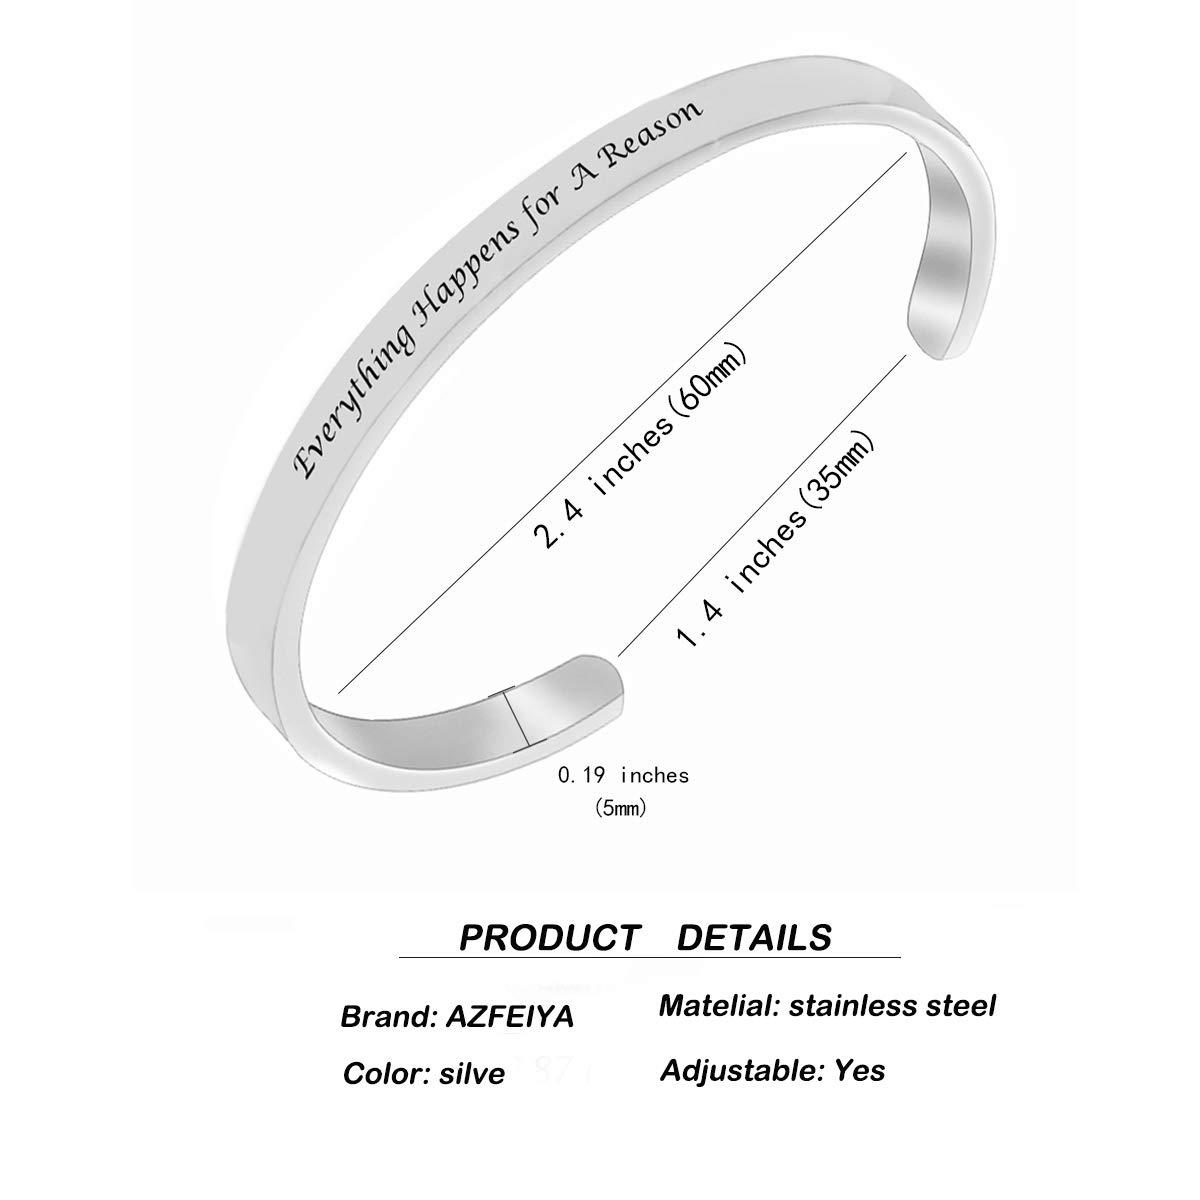 AZFEIYA Inspirational Bracelet Confidence Jewelry Motivational Cuff Bracelet Everything Happens for a Reason Encouragement Bracelet Personalized Birthday Gift (Silver Bracelet) by AZFEIYA (Image #2)